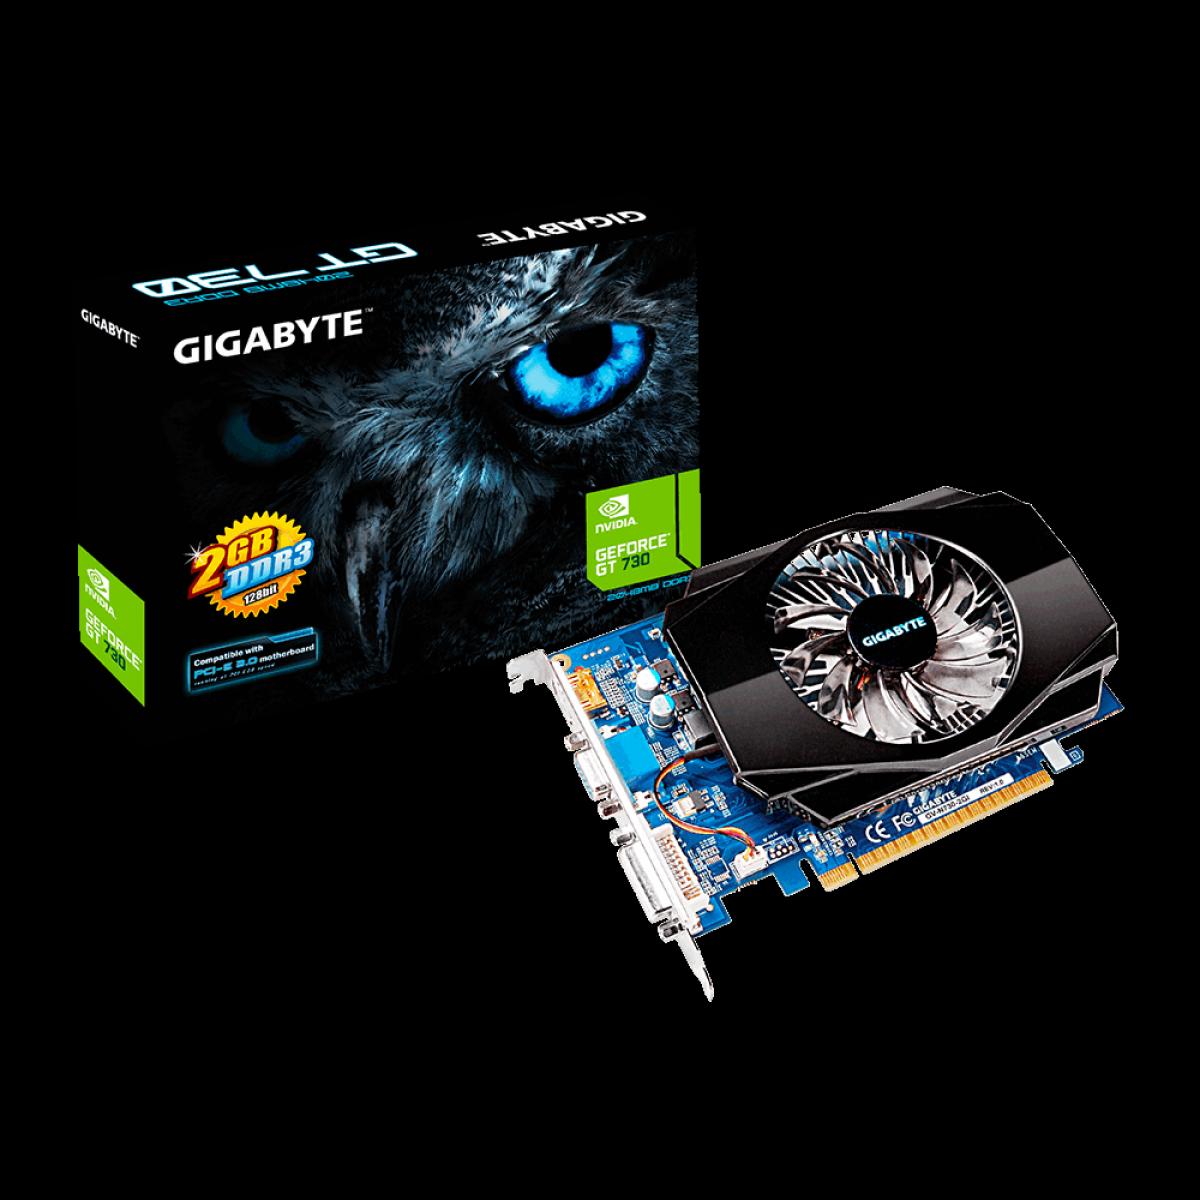 Placa de Vídeo Gigabyte GeForce GT 730, 2GB, DDR3, 128bit, GV-N730-2GI